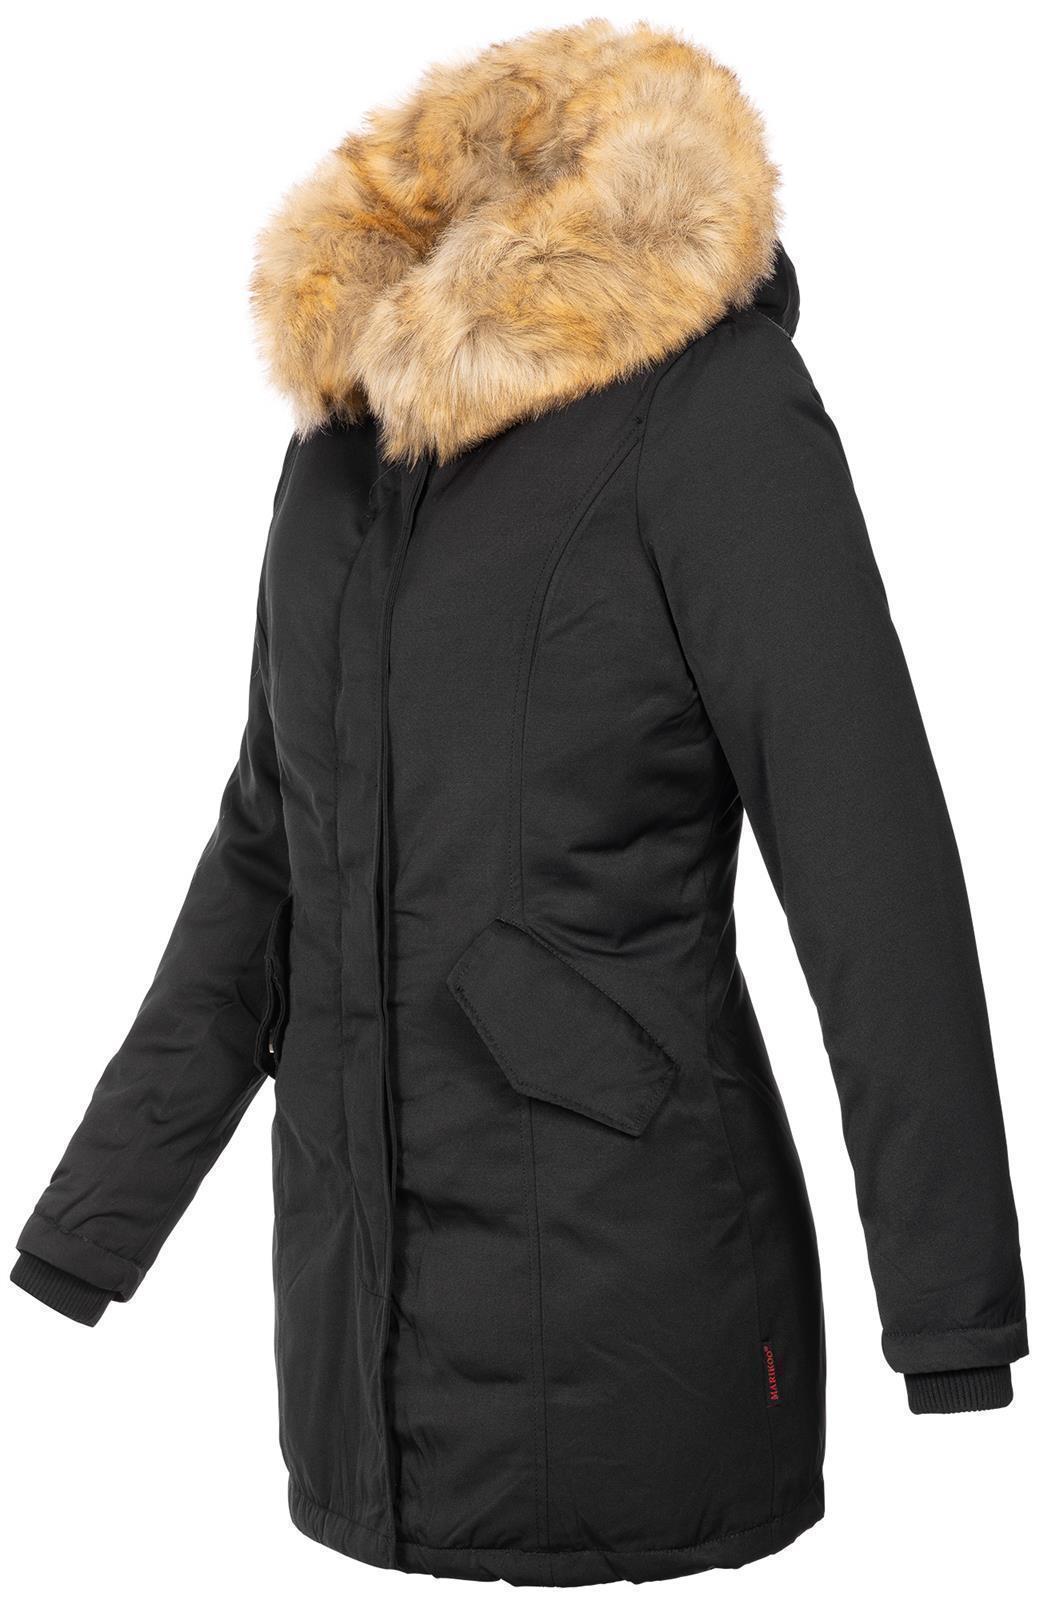 Eskimo Rivestimento Karmaa Marikoo Donna Cappotto Caldo Invernale B362 Giacca ZnYXOOqa